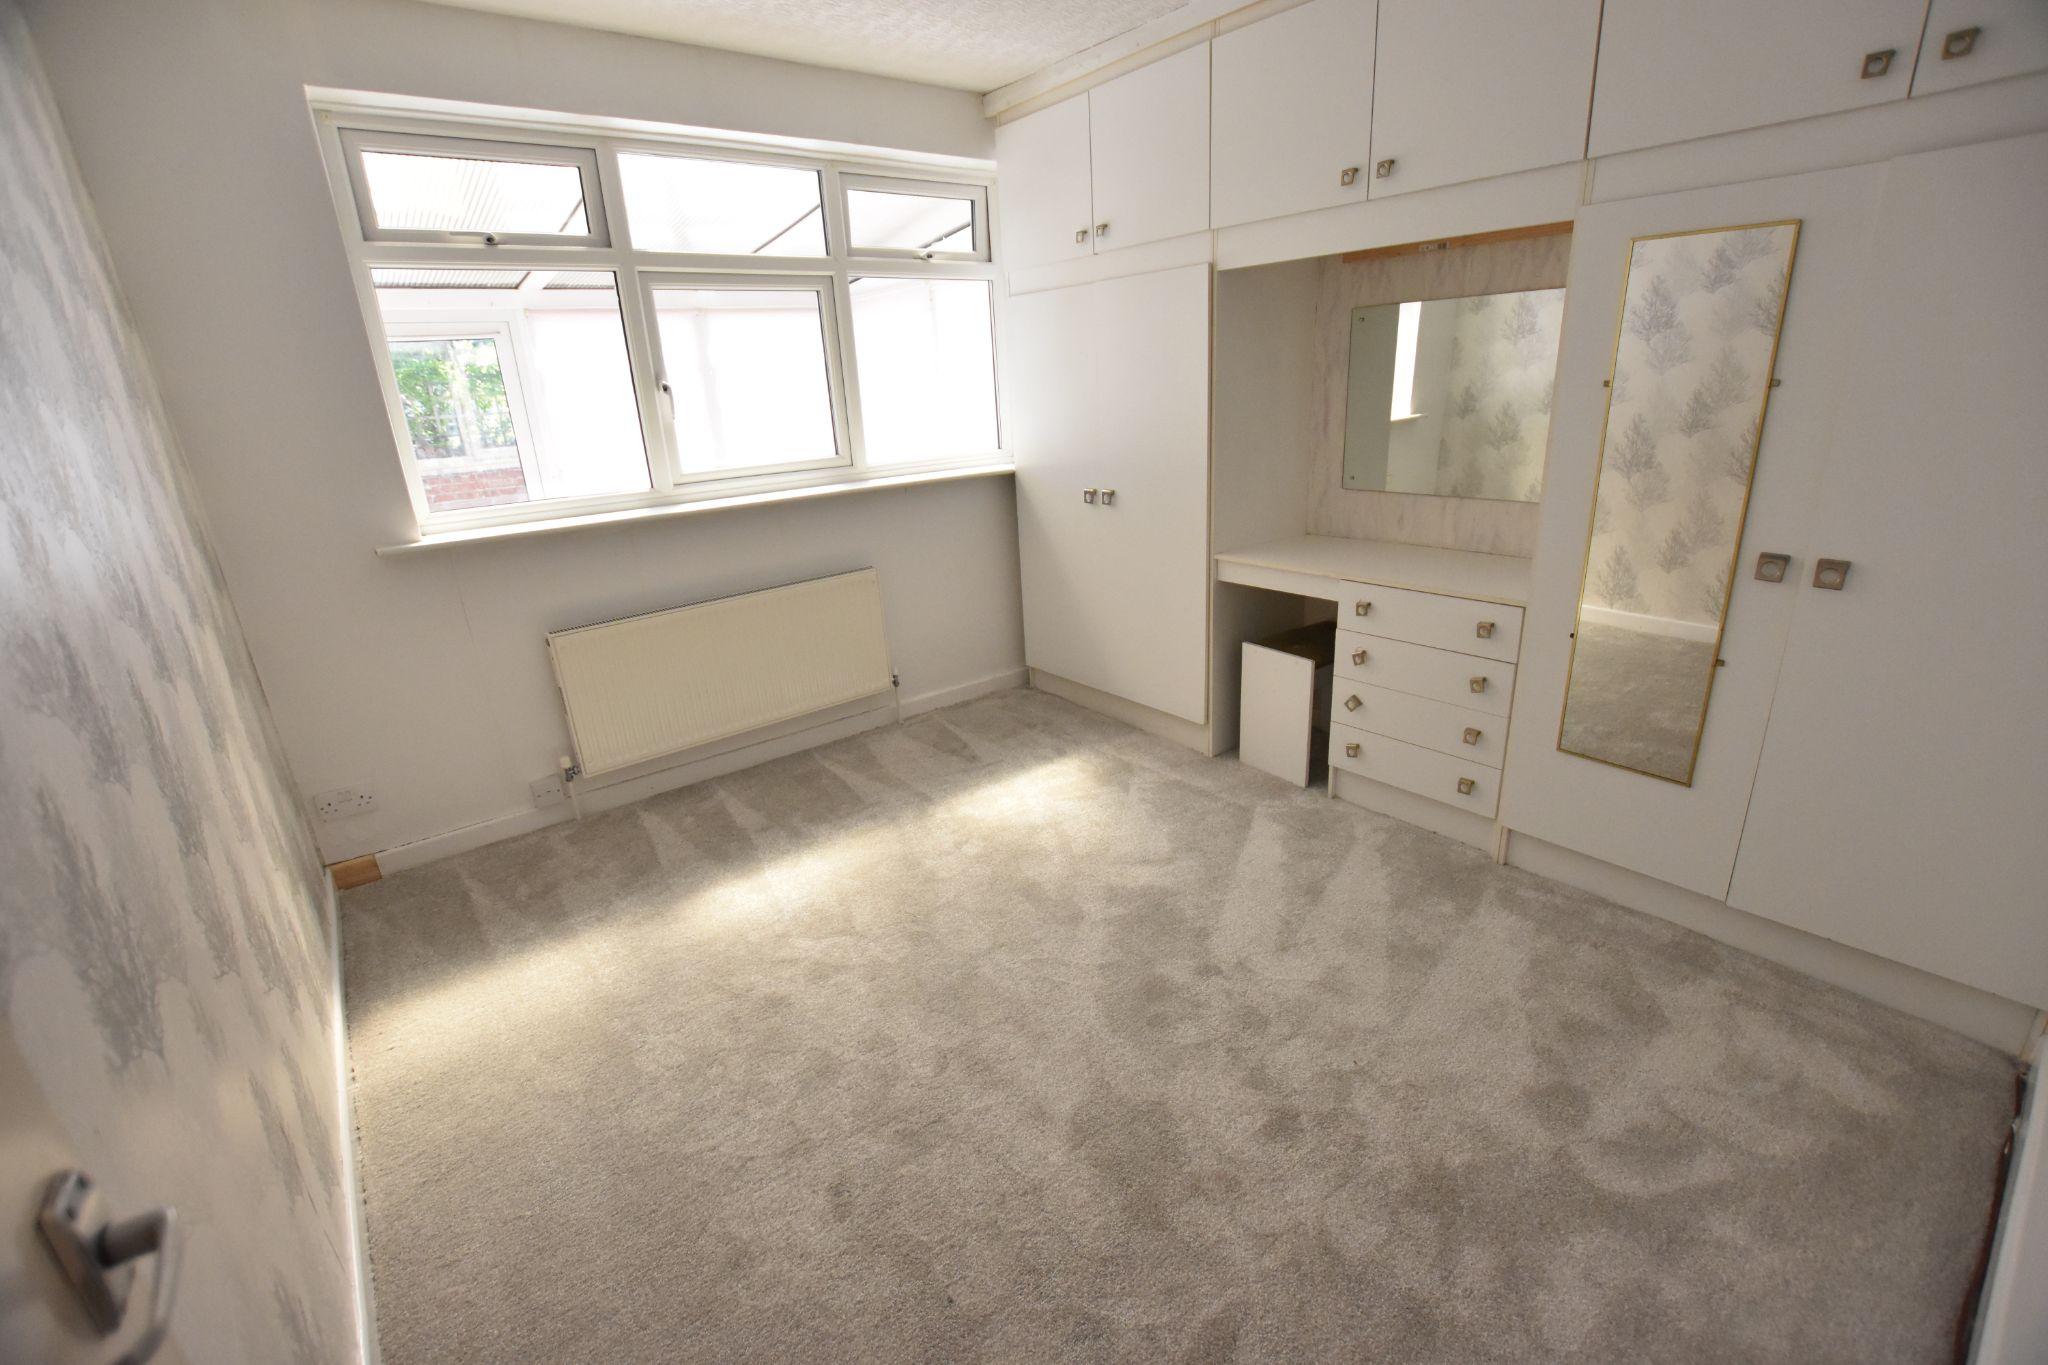 2 bedroom detached bungalow For Sale in Lytham St Annes - Bedroom 1